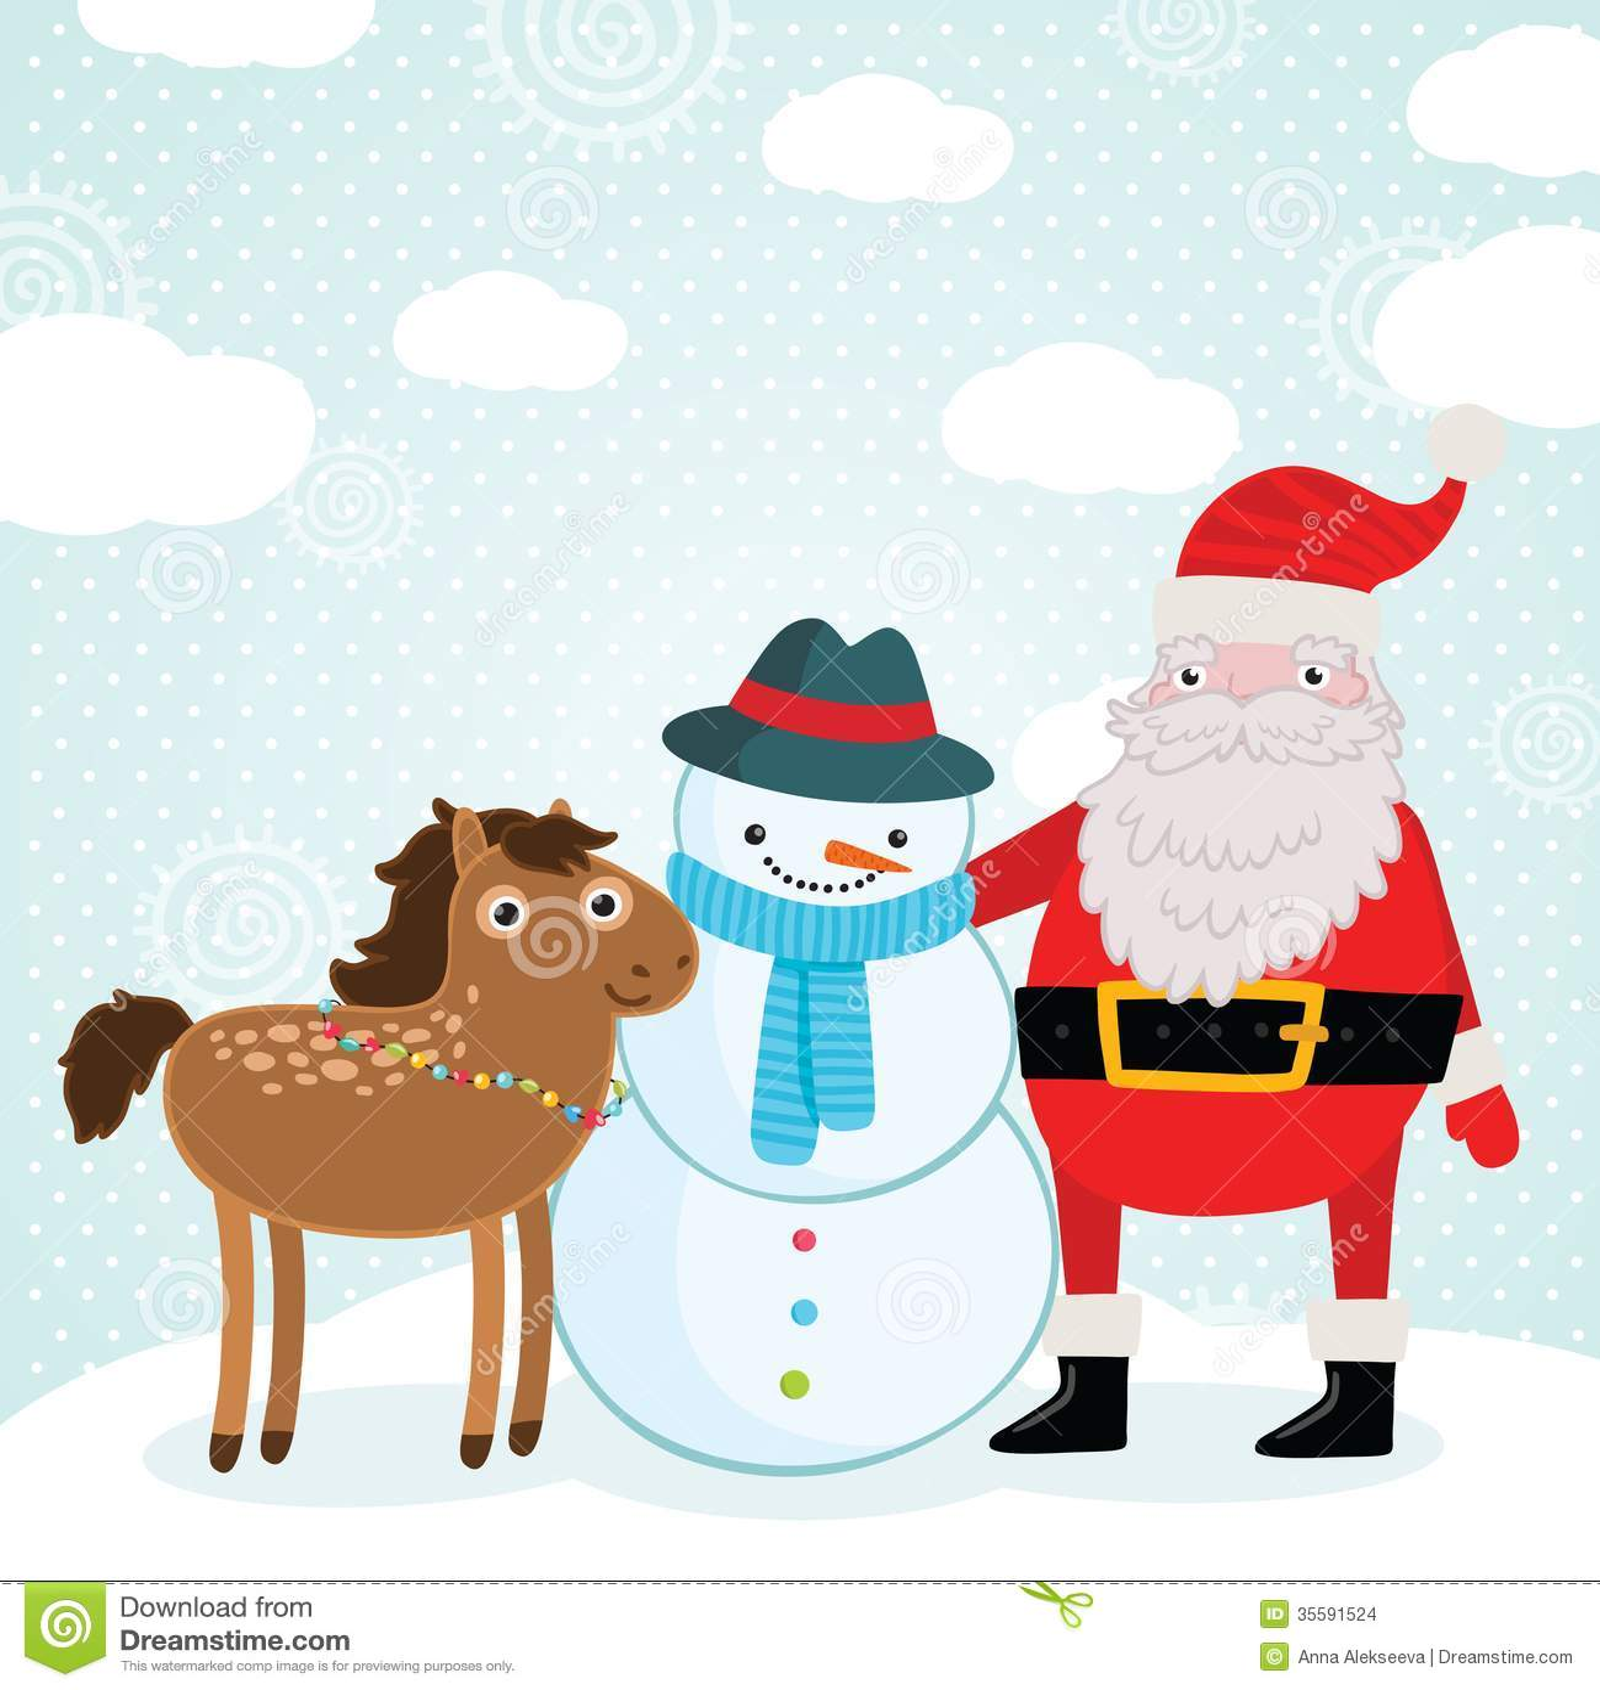 Christmas Horse Holiday Illustration Stock Vector Illustration Of Horse Element 35591524